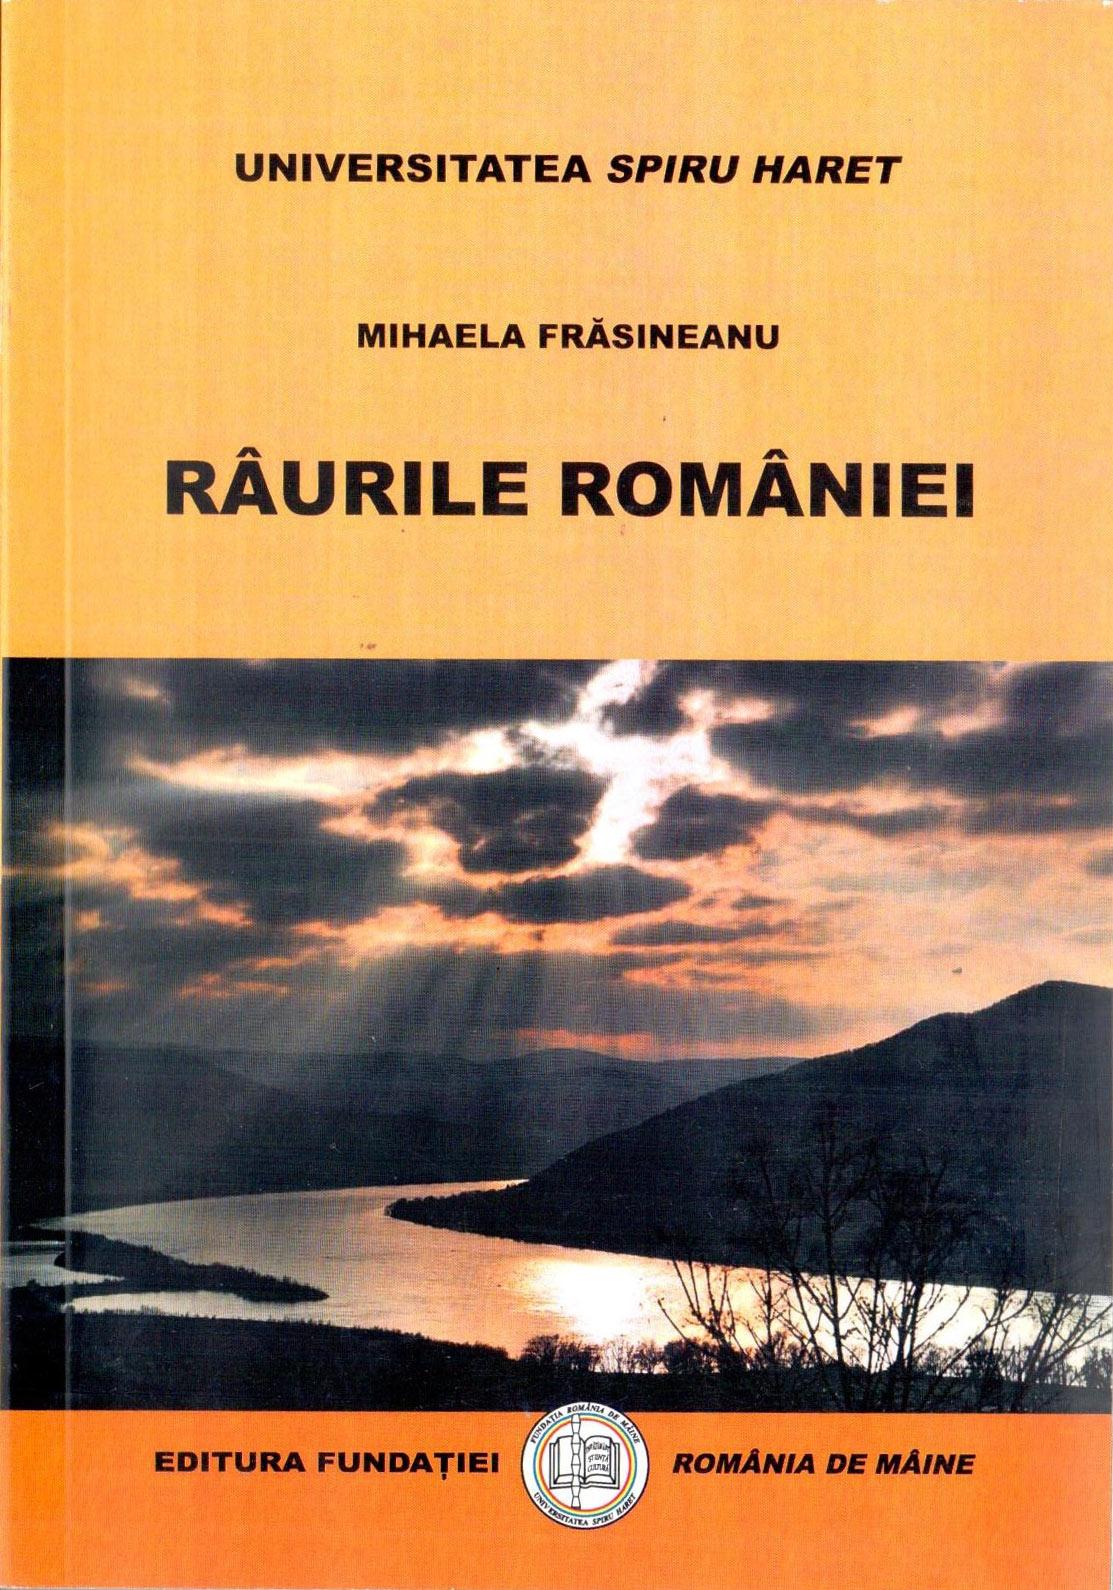 Raurile Romaniei